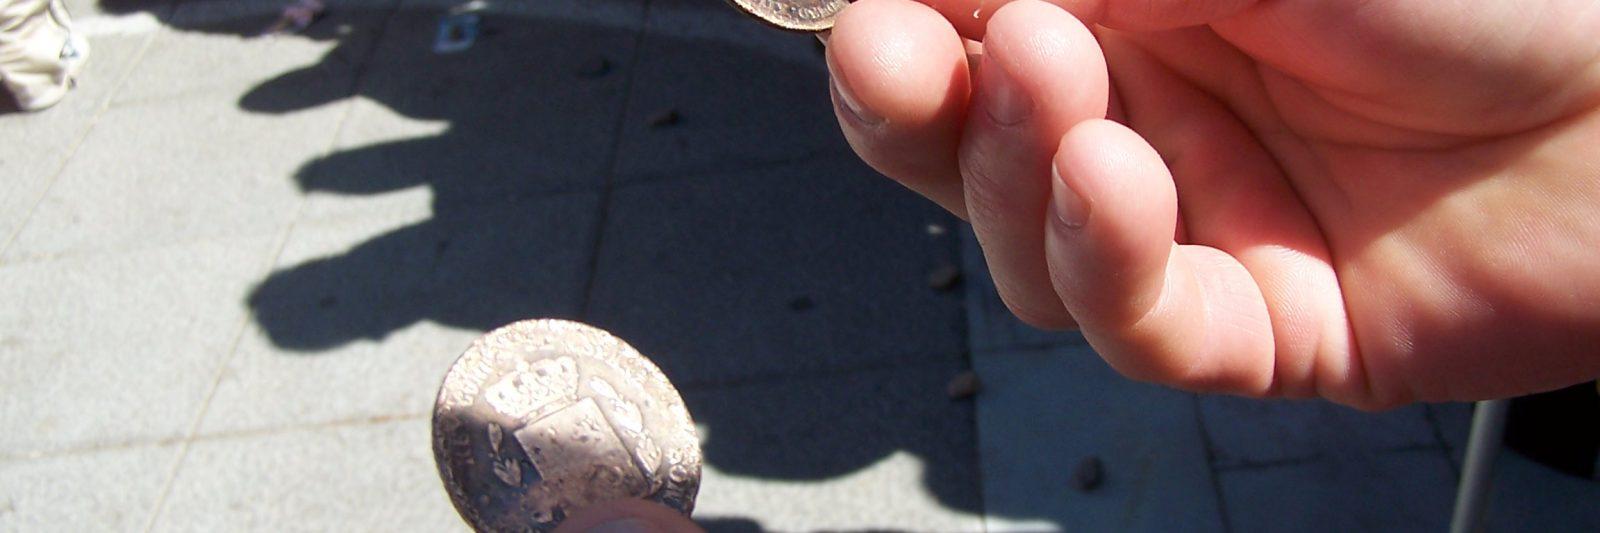 Monedas de Las Caras